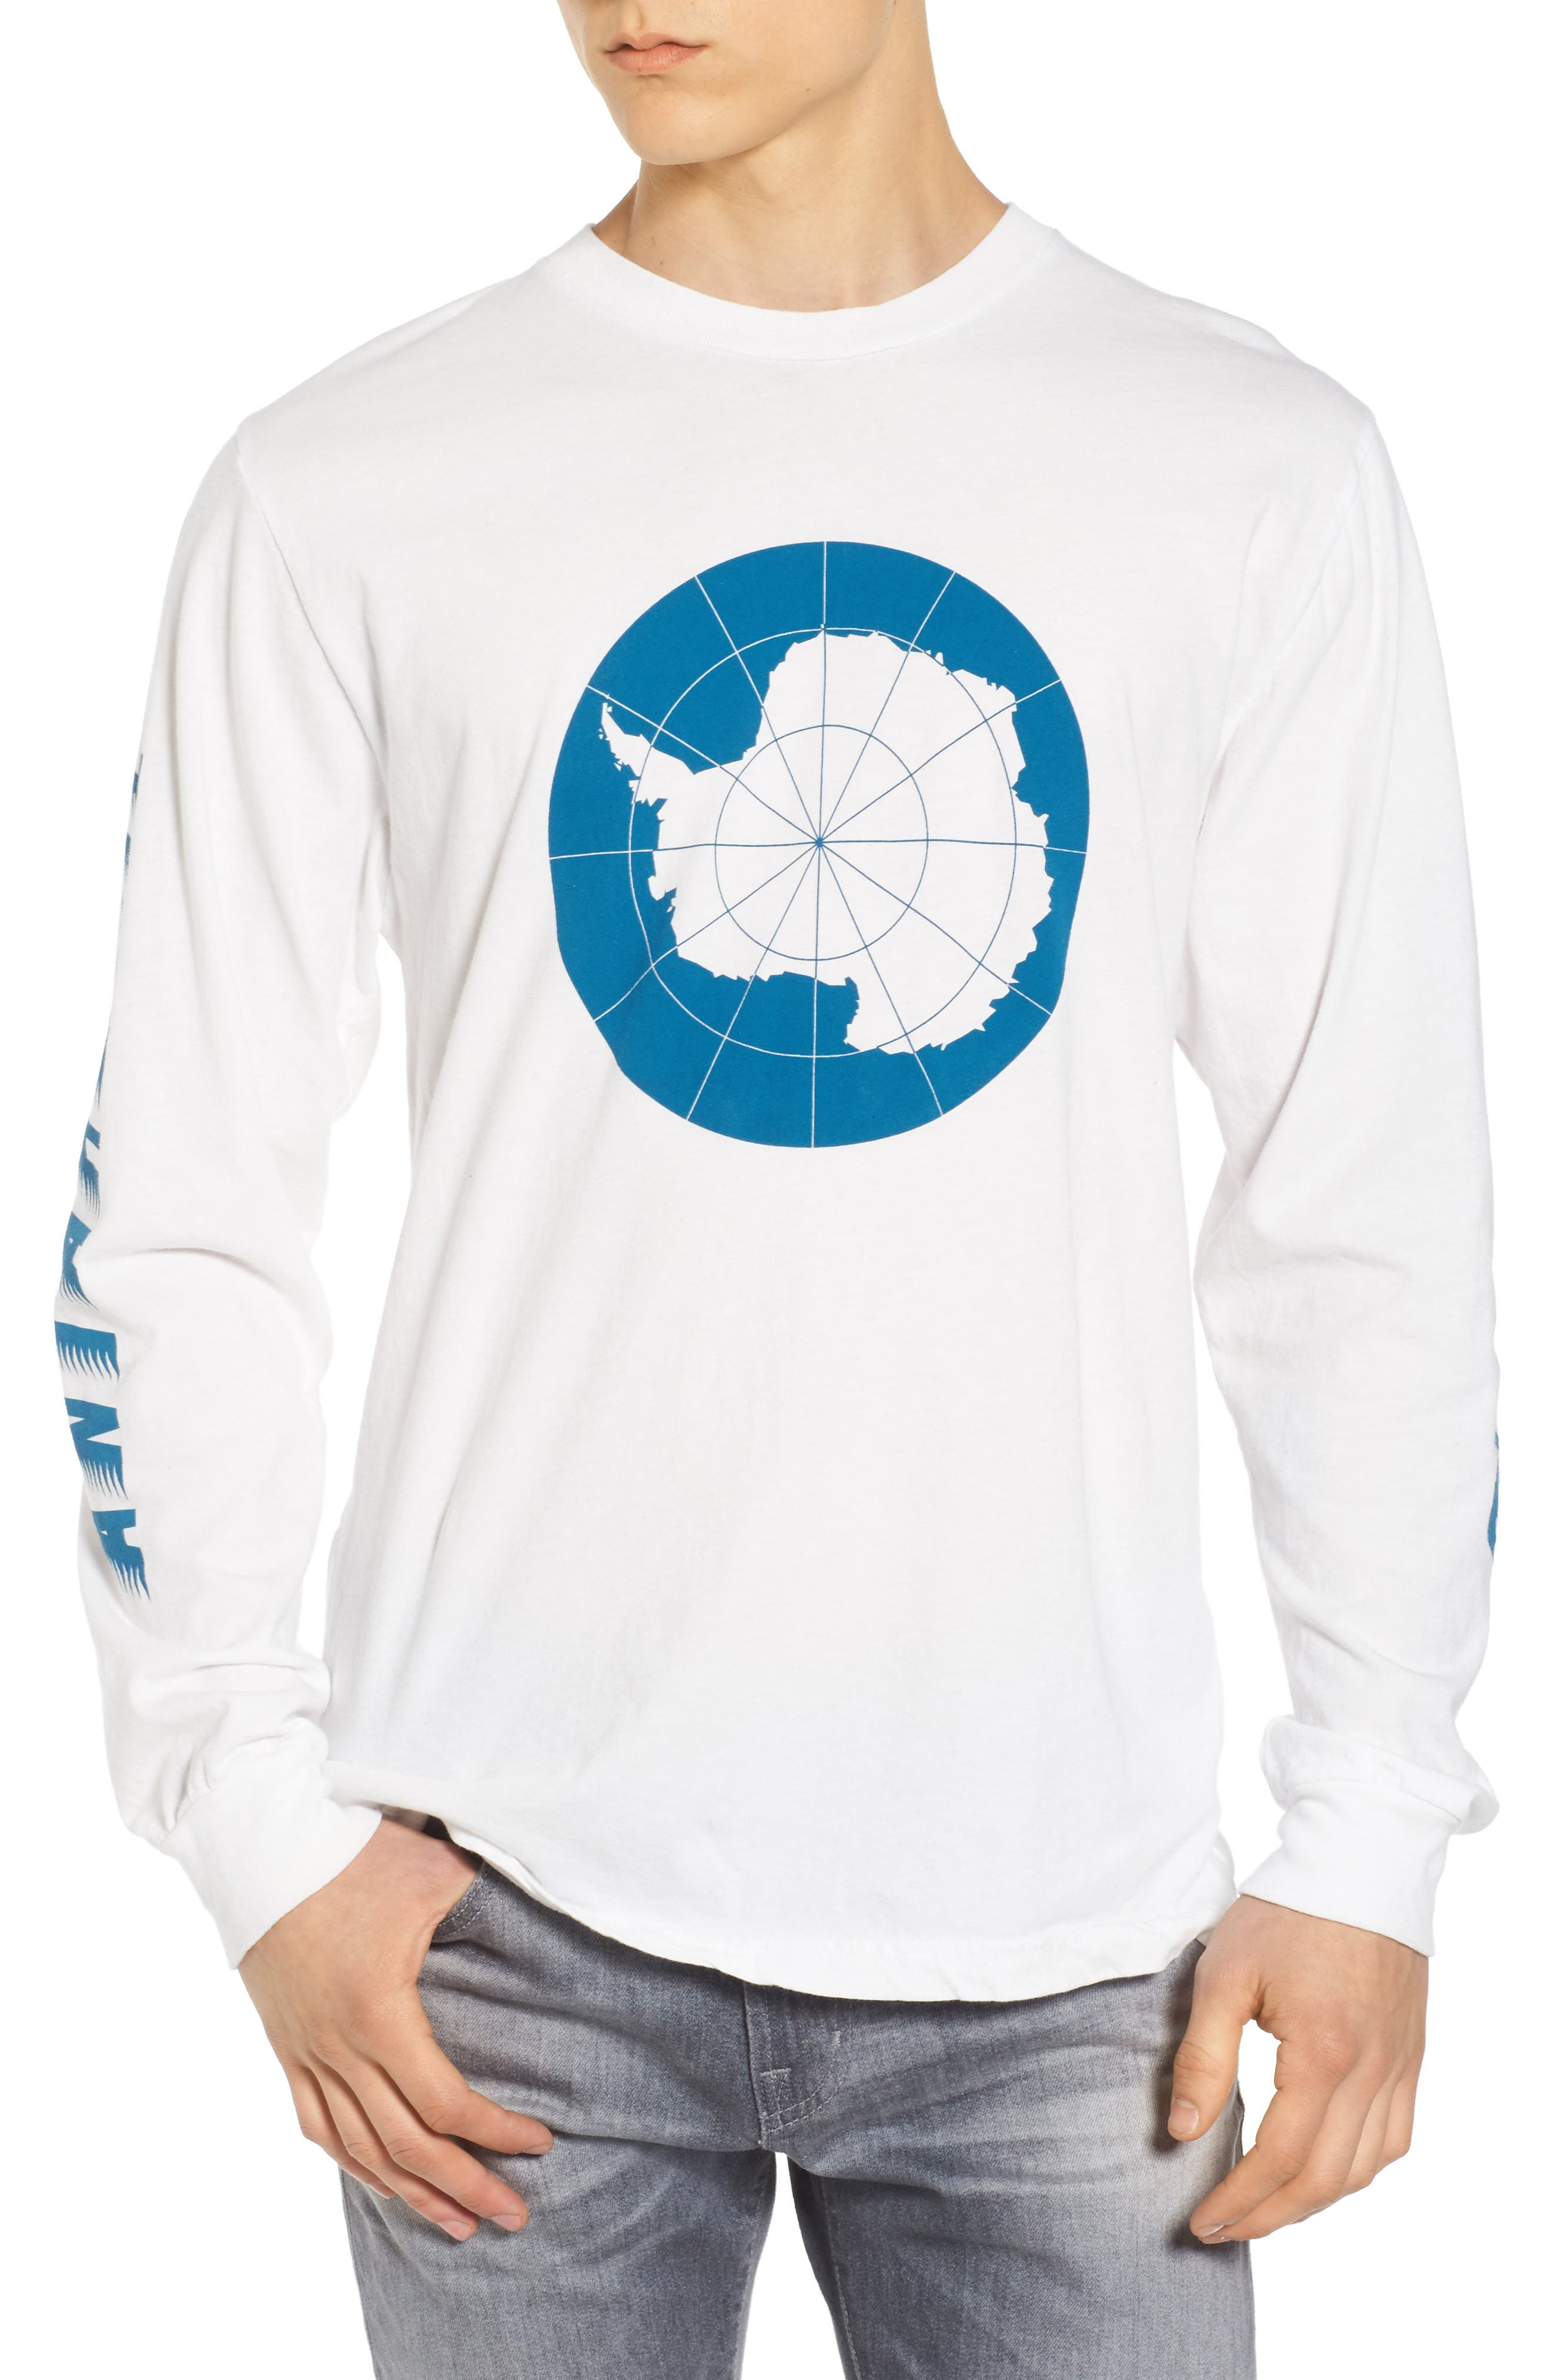 Arctic Ski Club T-Shirt,                         Main,                         color, 100